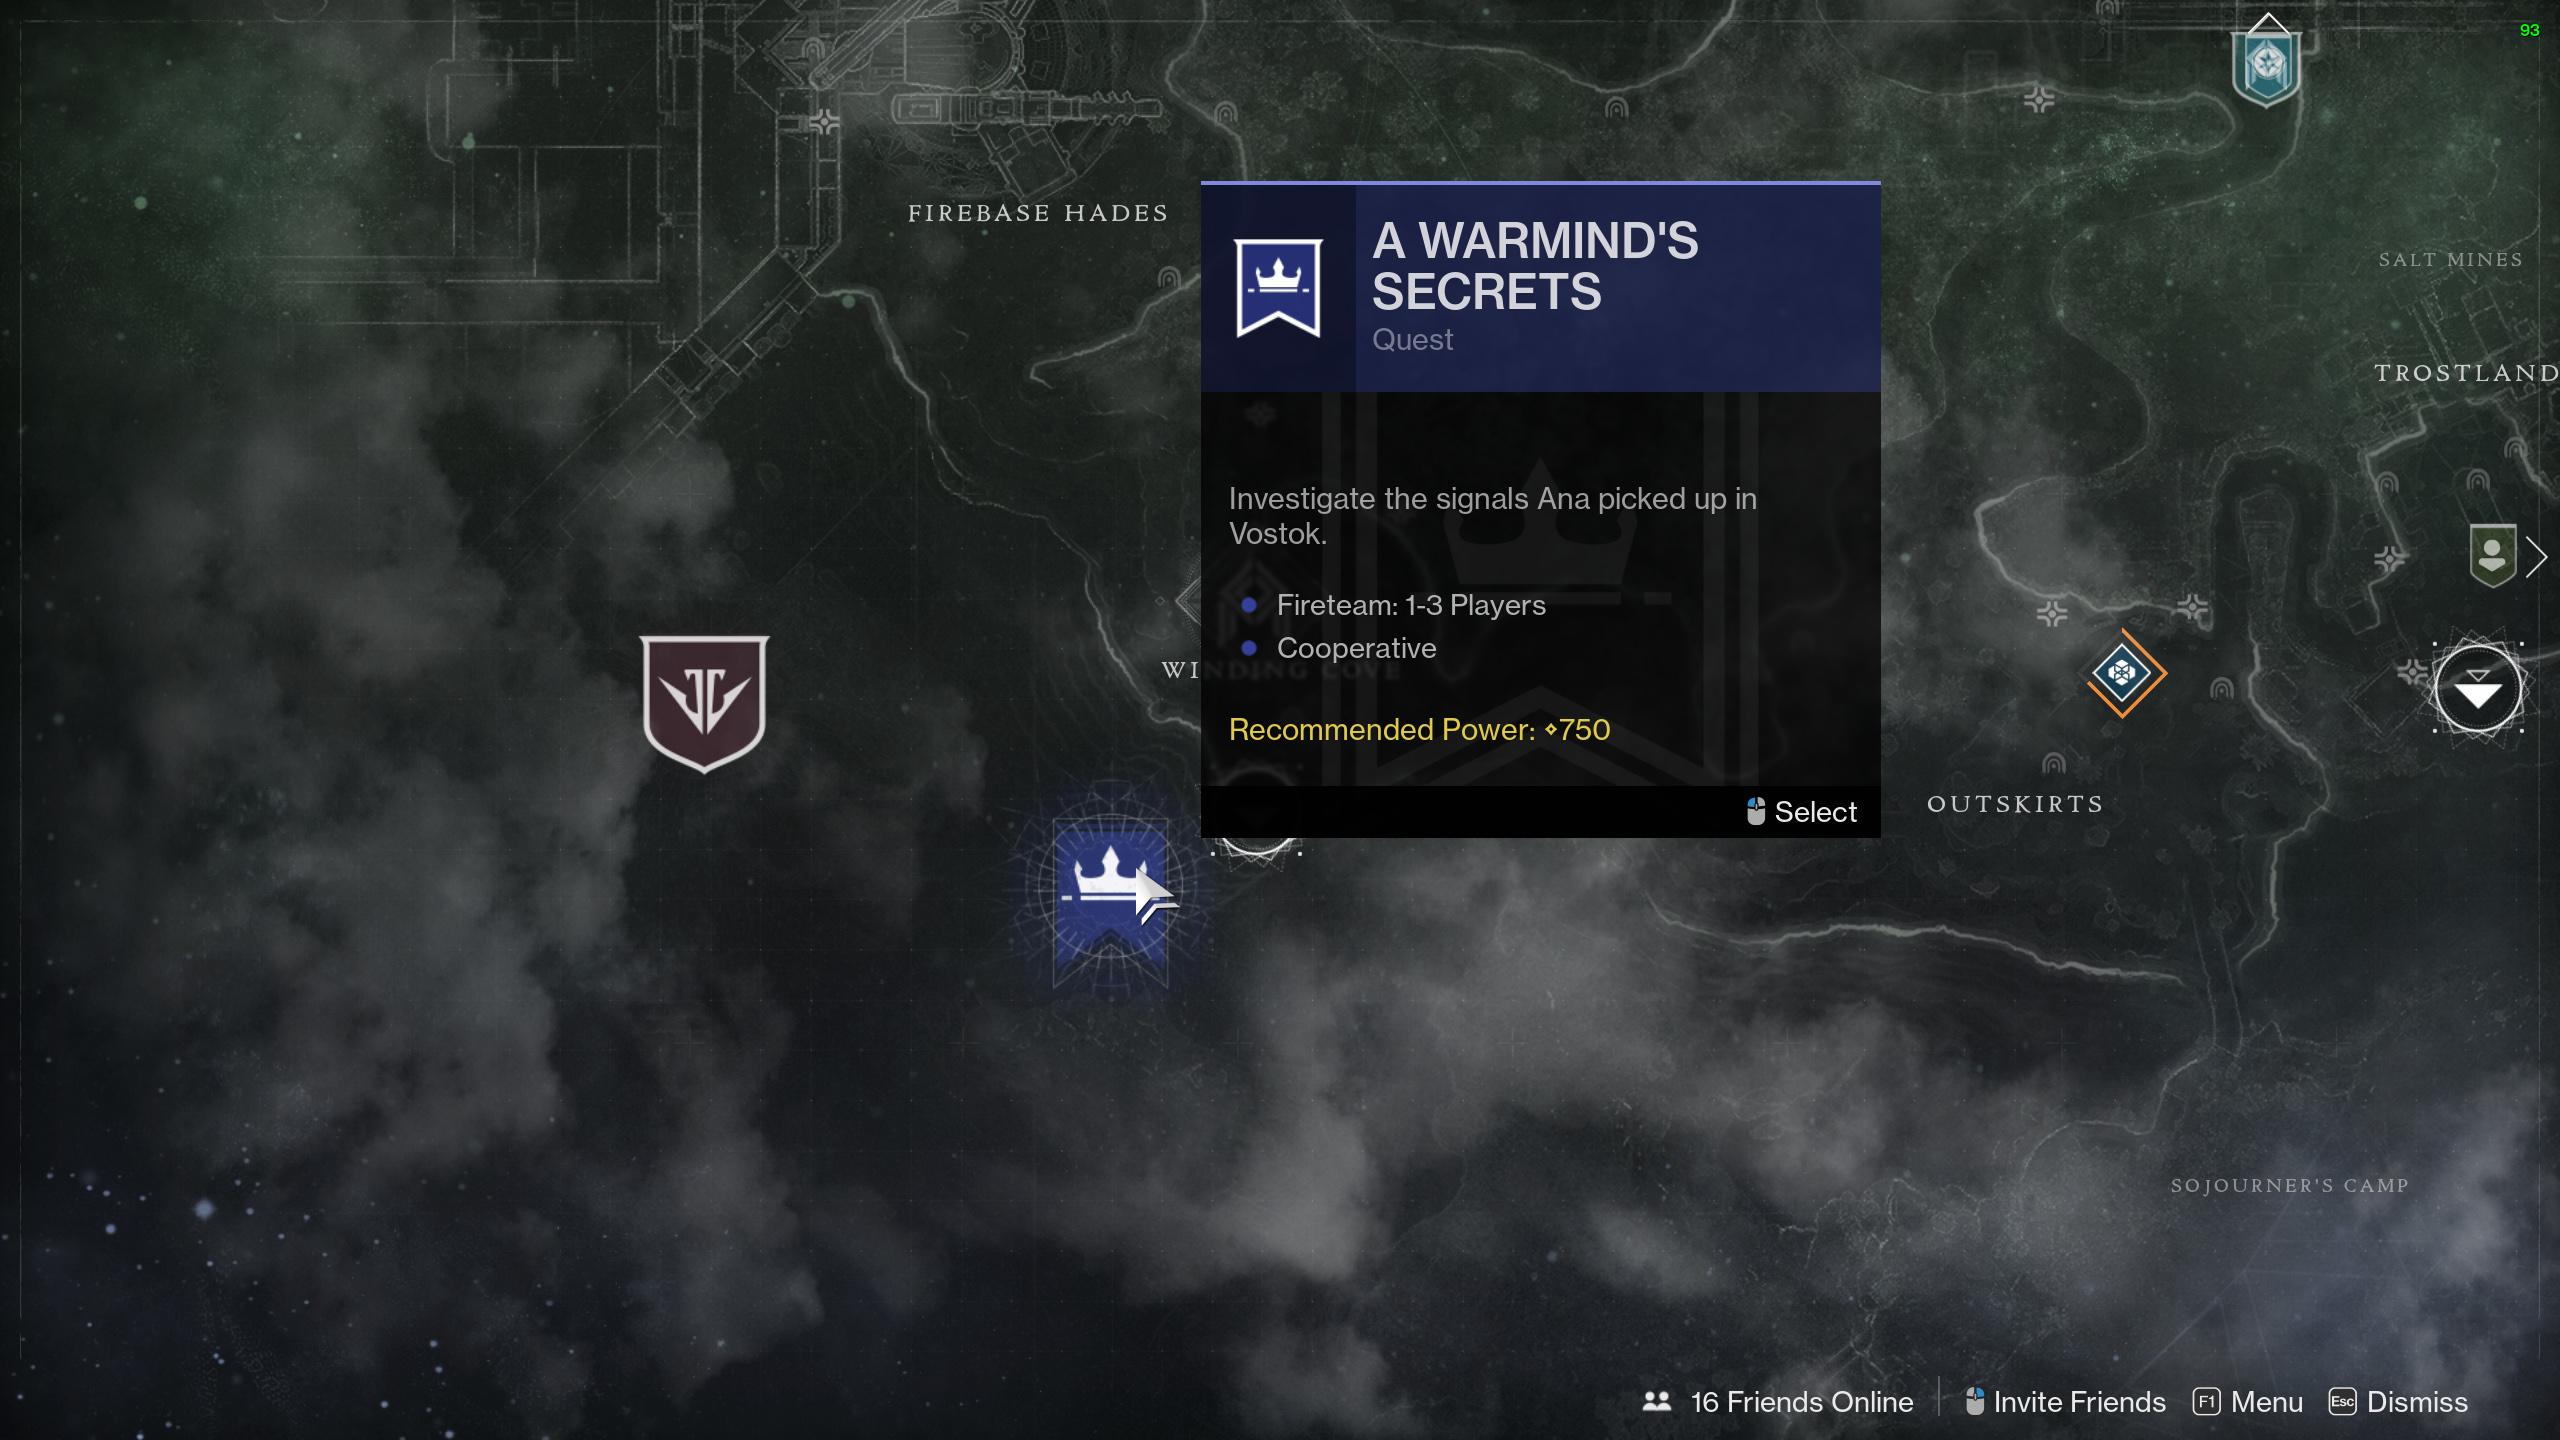 Destiny 2 The Lie Vostok Visited A Warmind's Secrets